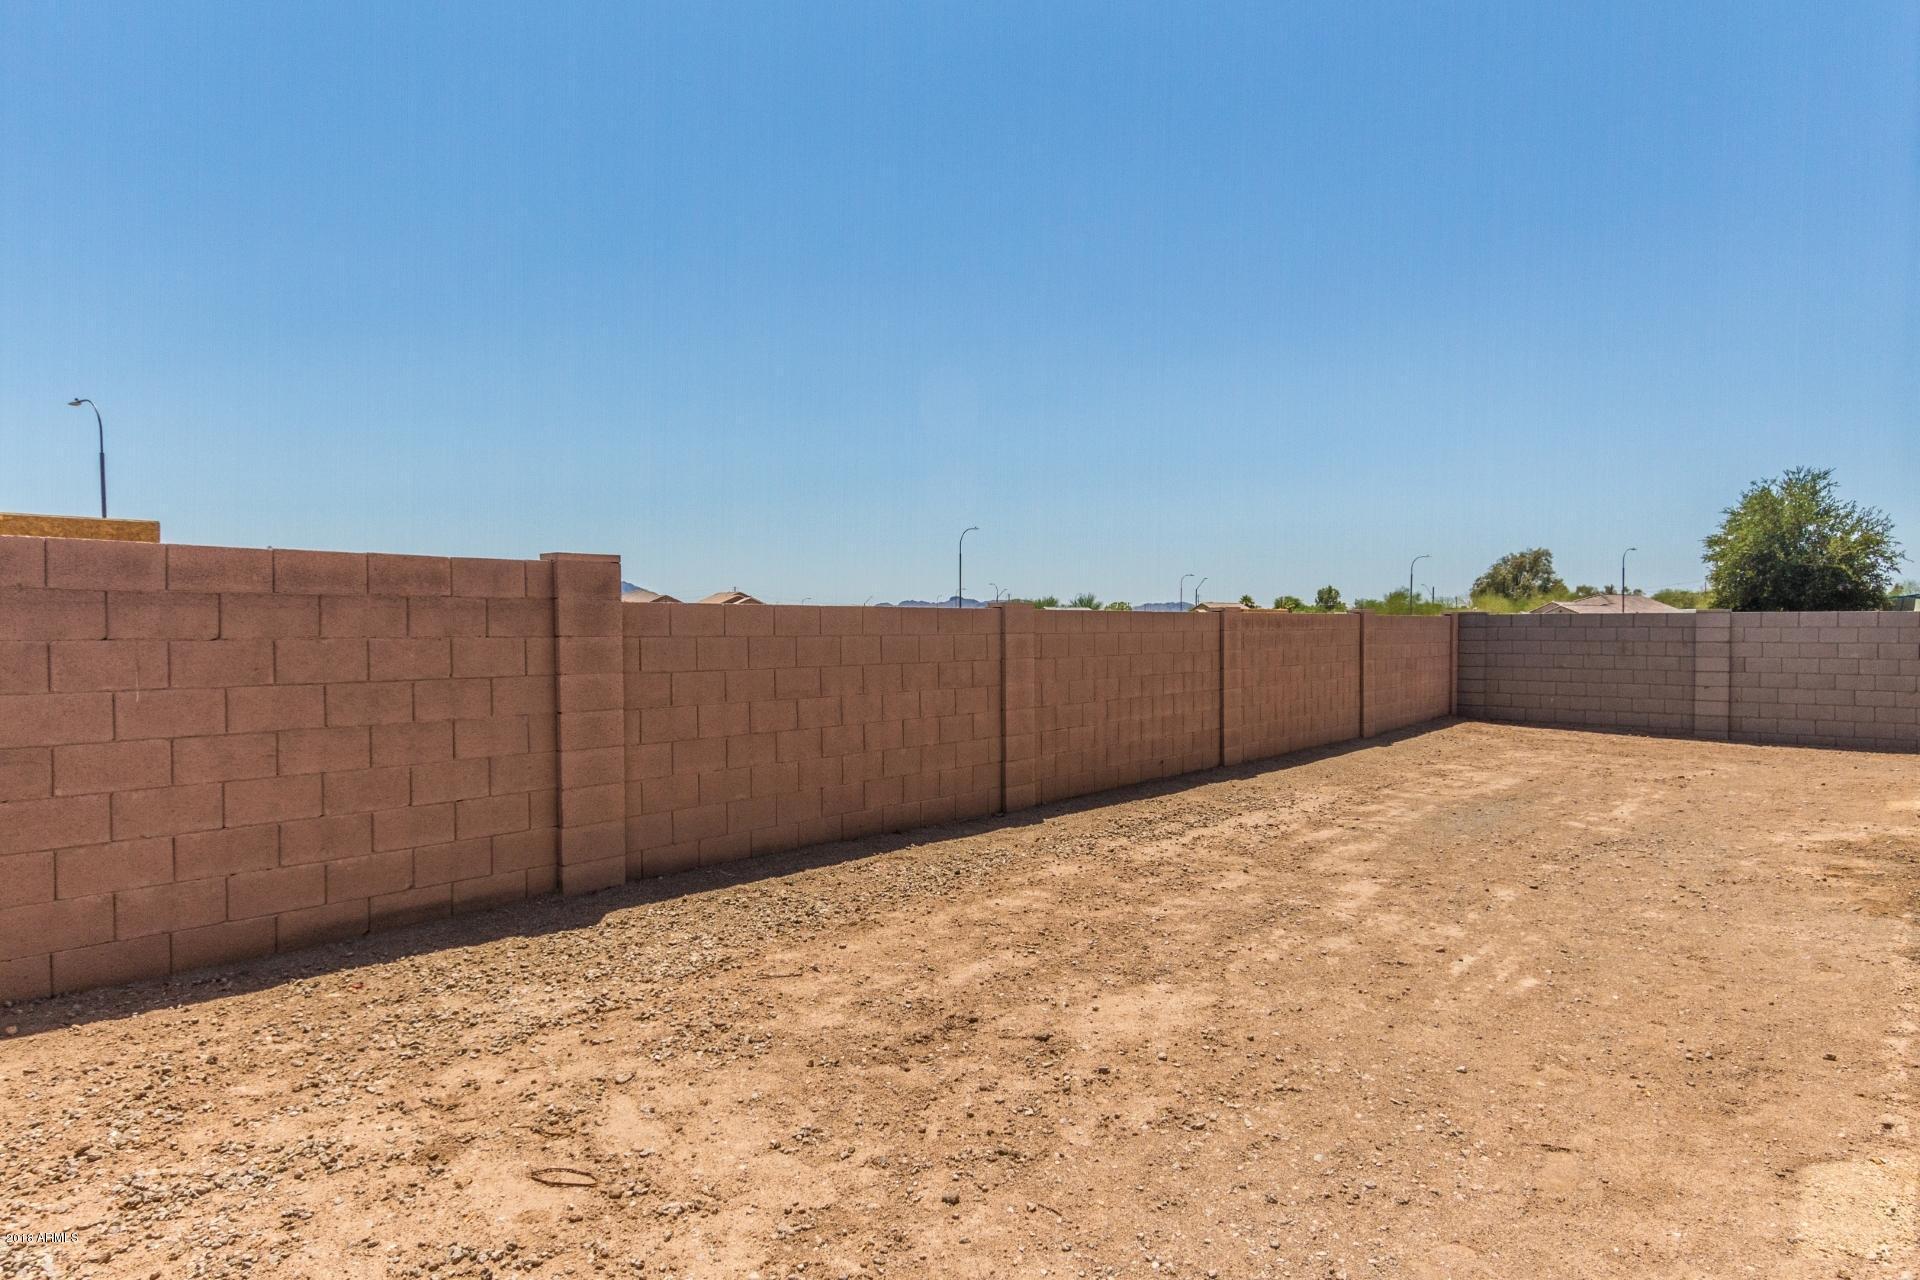 MLS 5779648 12205 W WINSLOW Avenue, Tolleson, AZ 85353 Tolleson AZ Newly Built